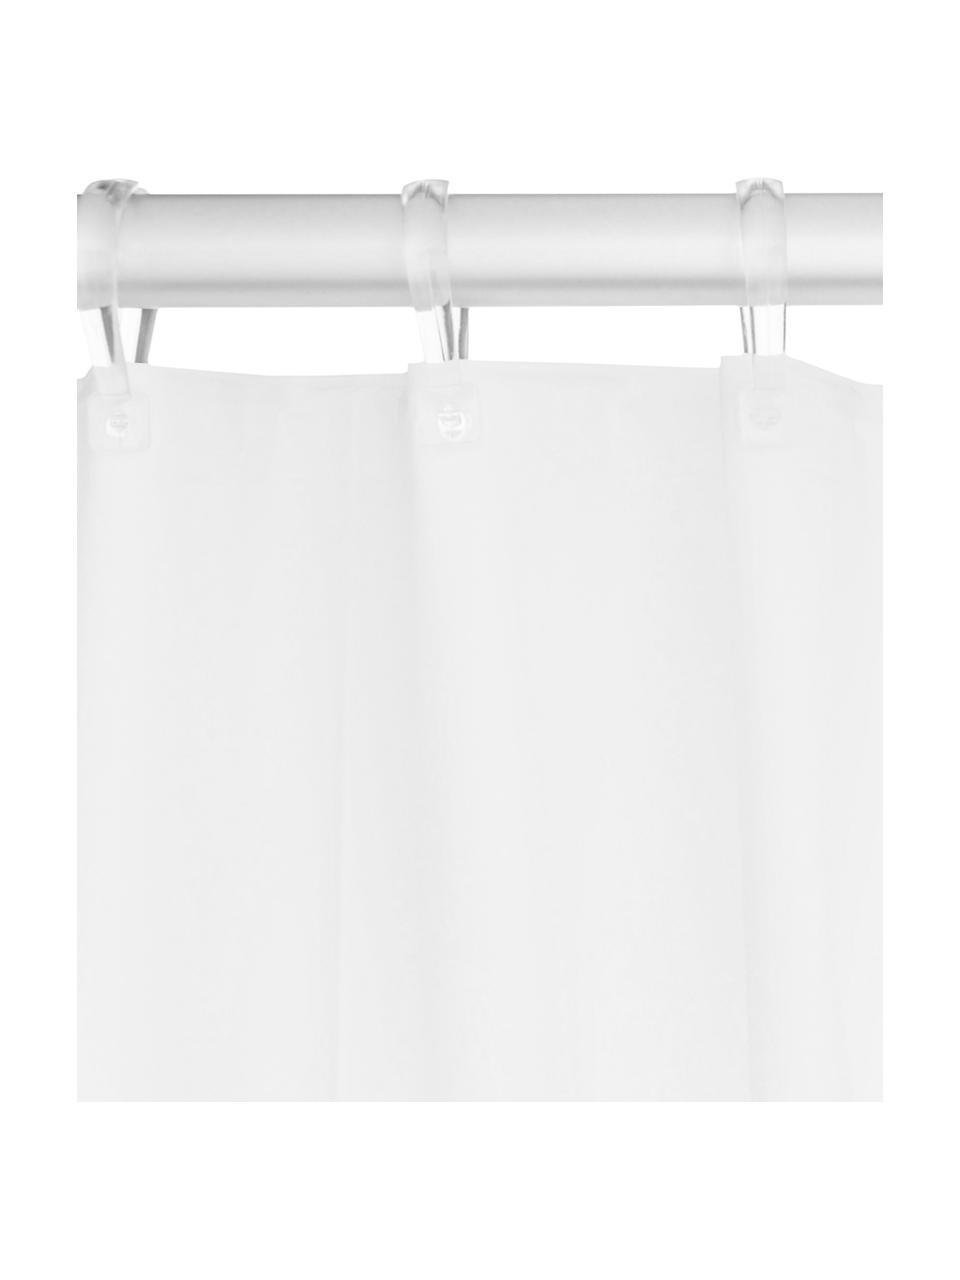 Rideau de douche blanc Granada, Blanc